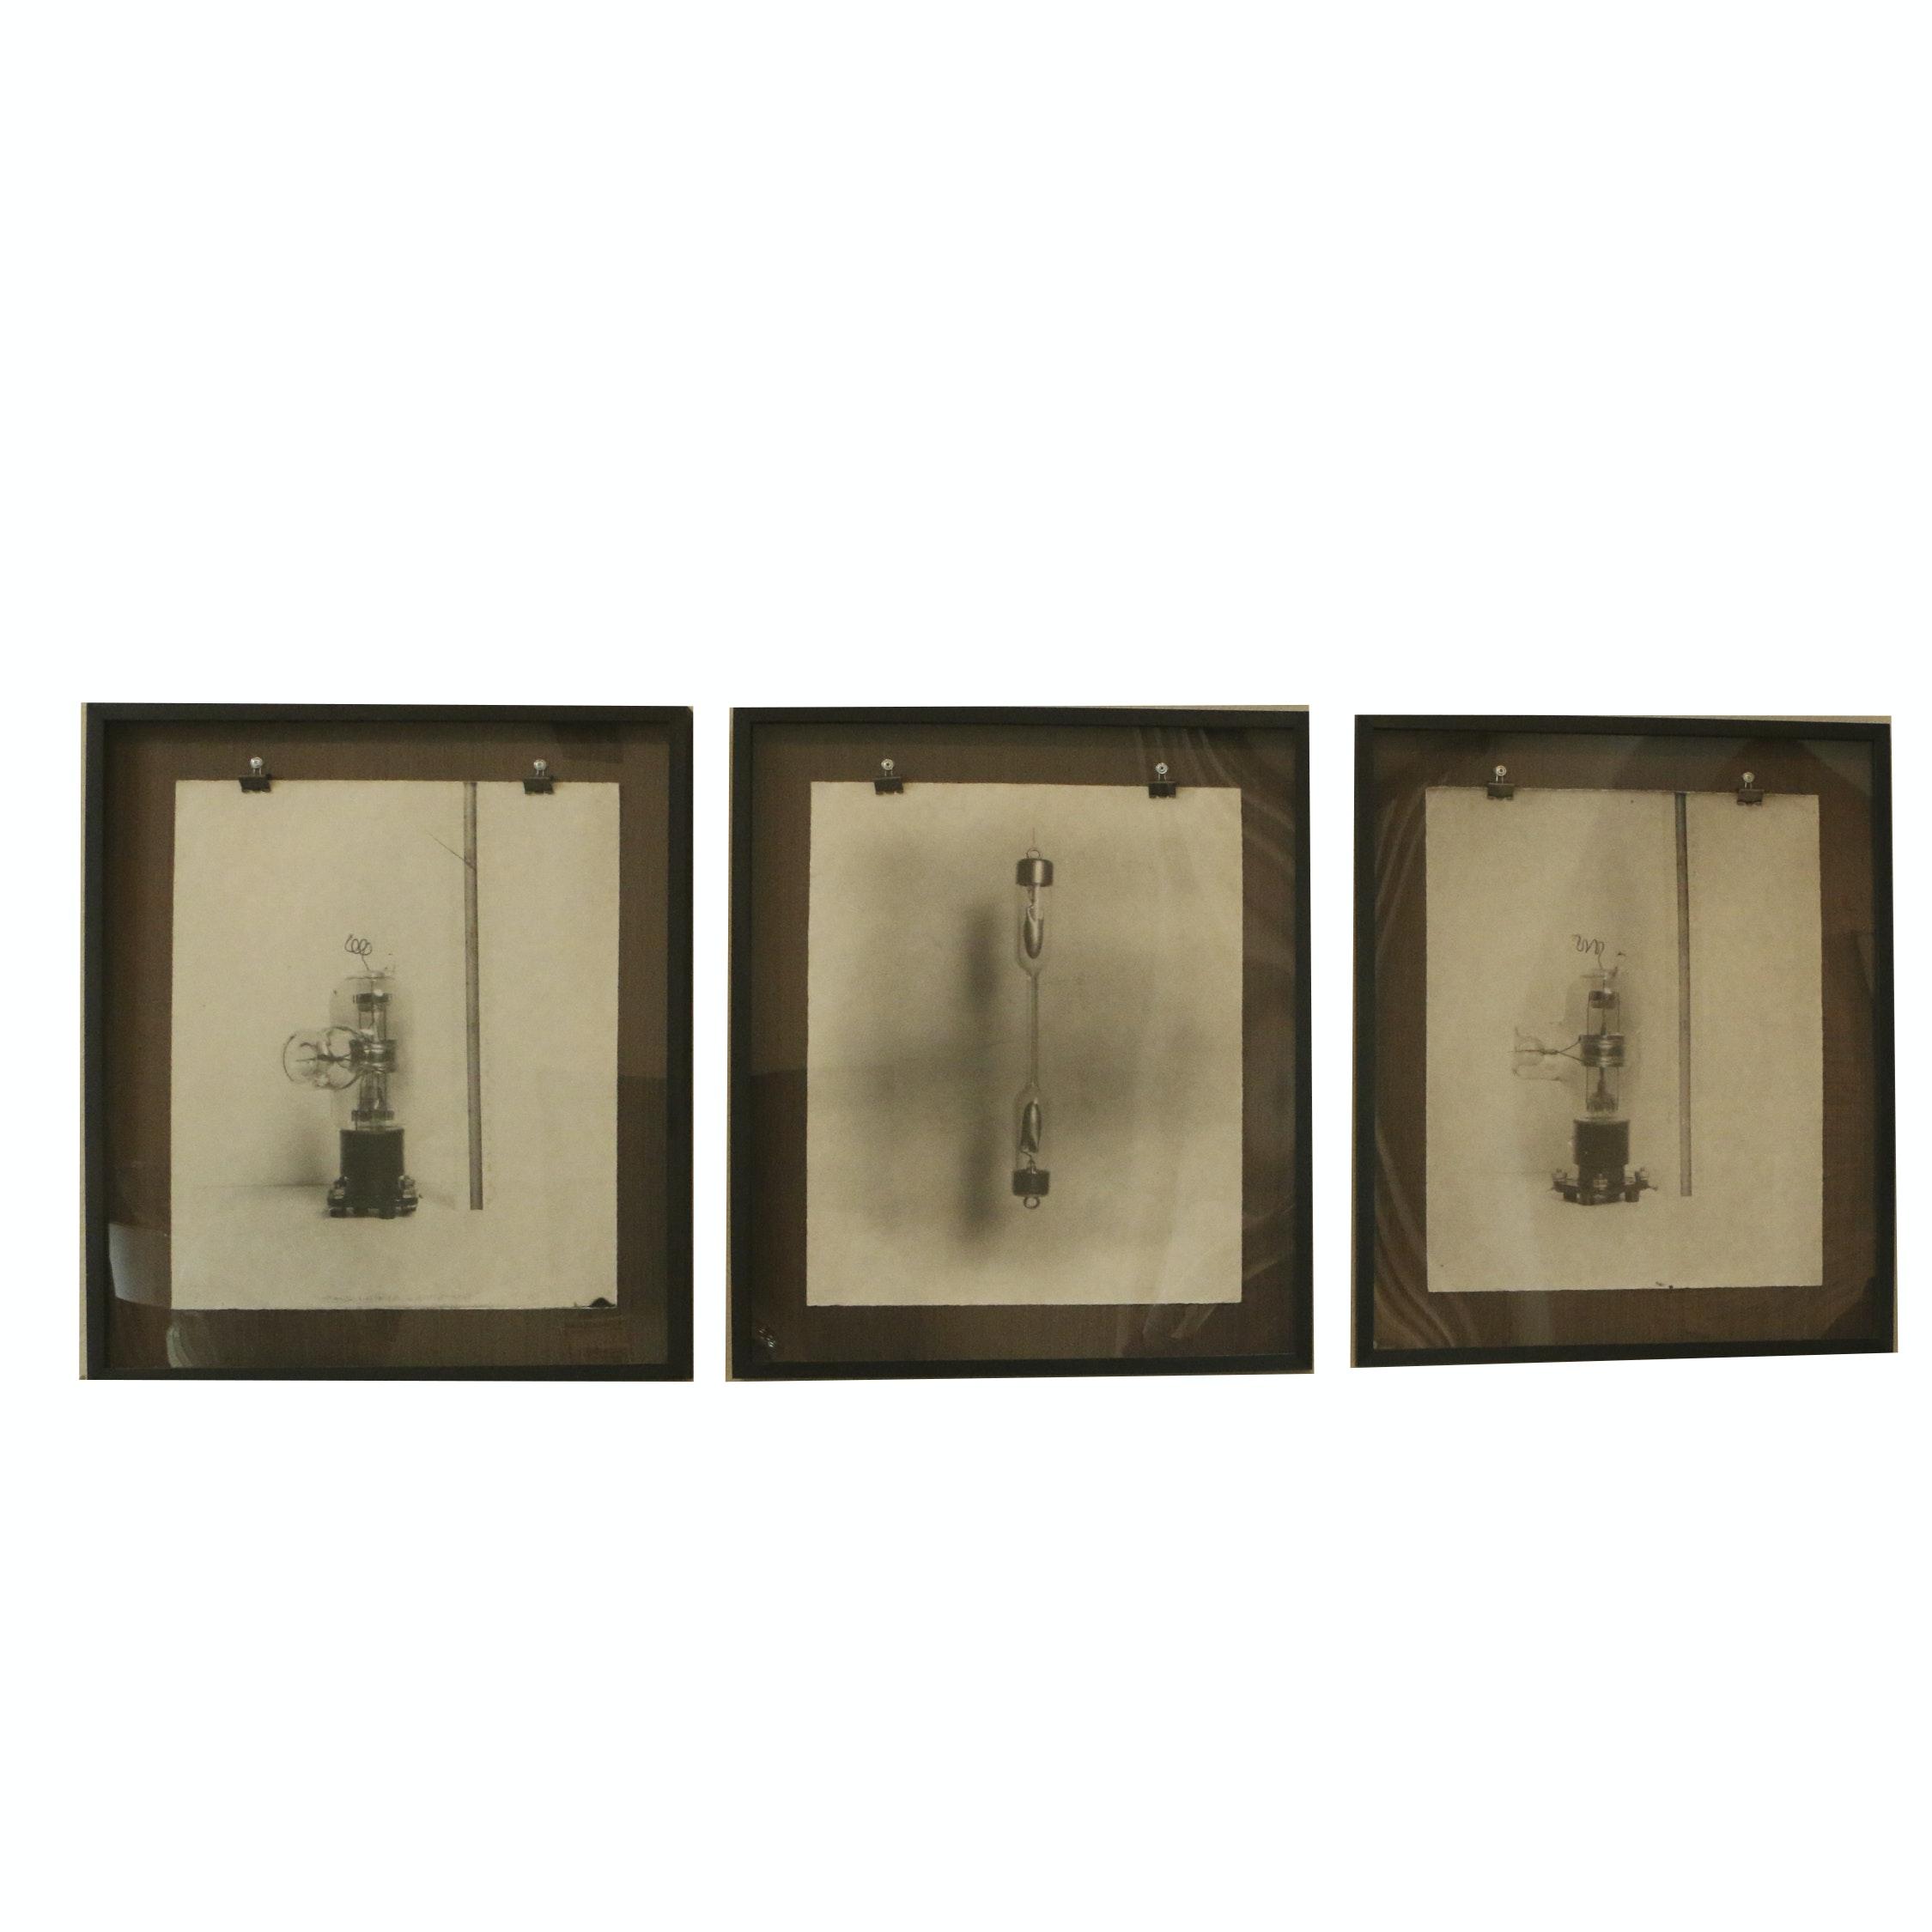 Offset Lithographs of Lightbulbs